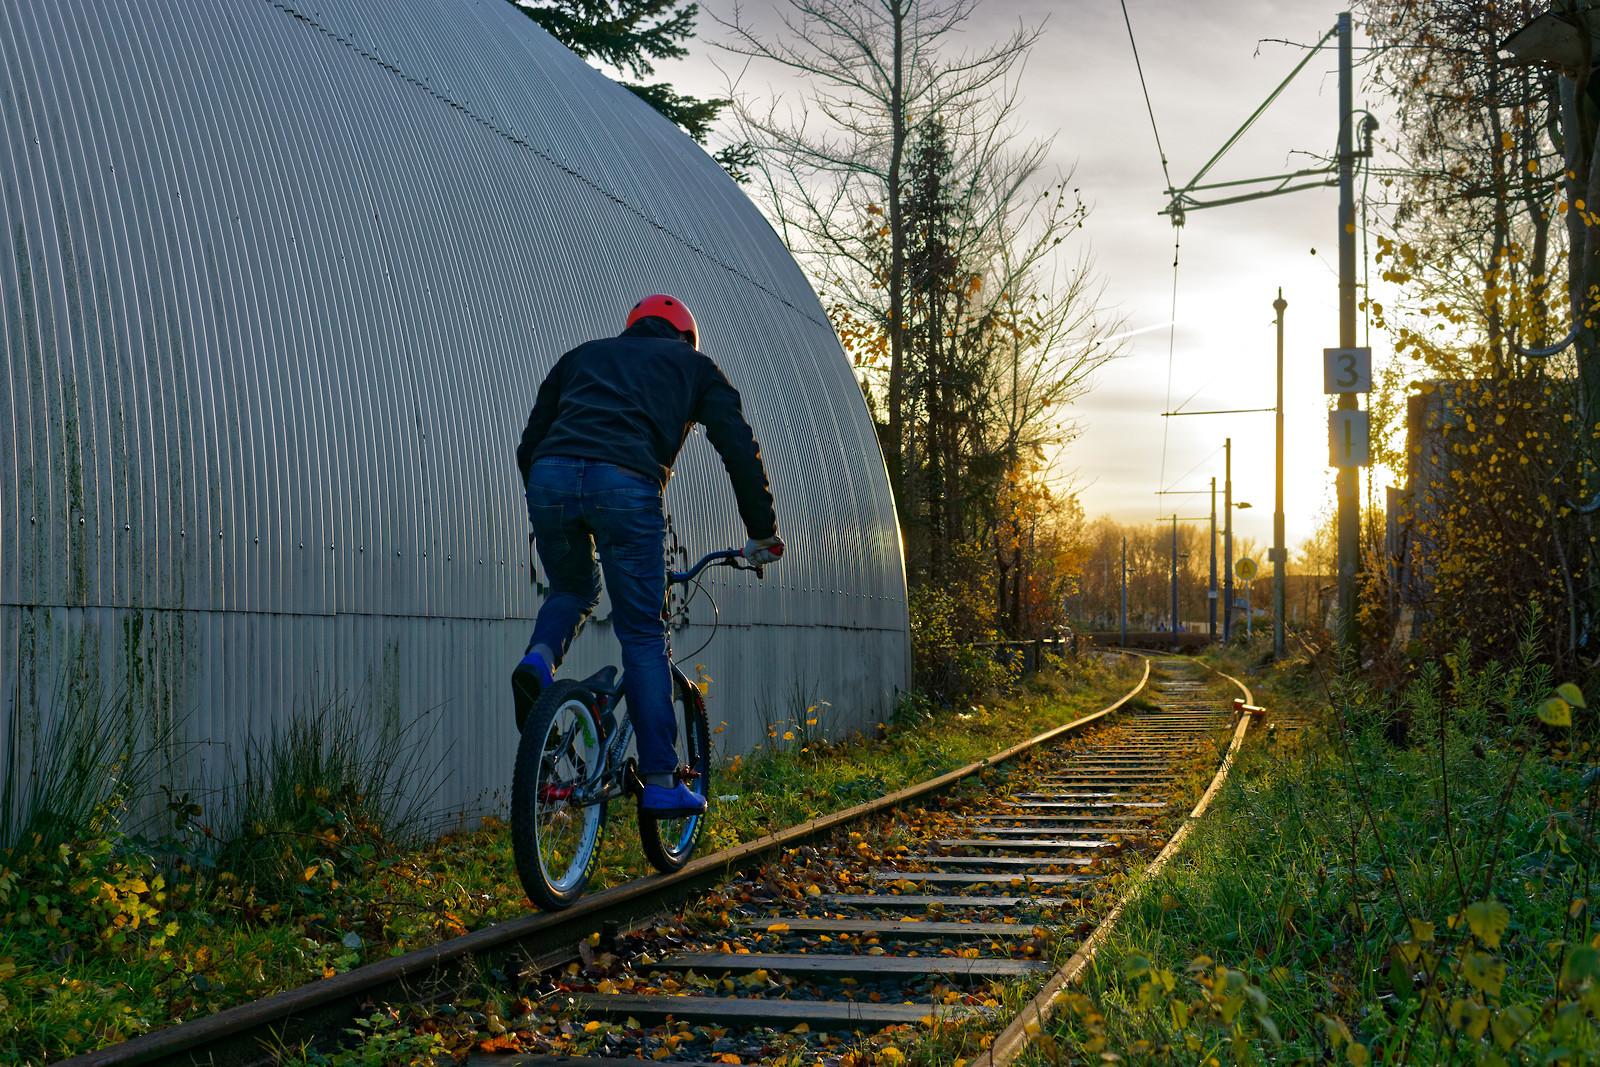 Train Tracks Amsterdam - Boozzz - Mountain Biking Pictures - Vital MTB